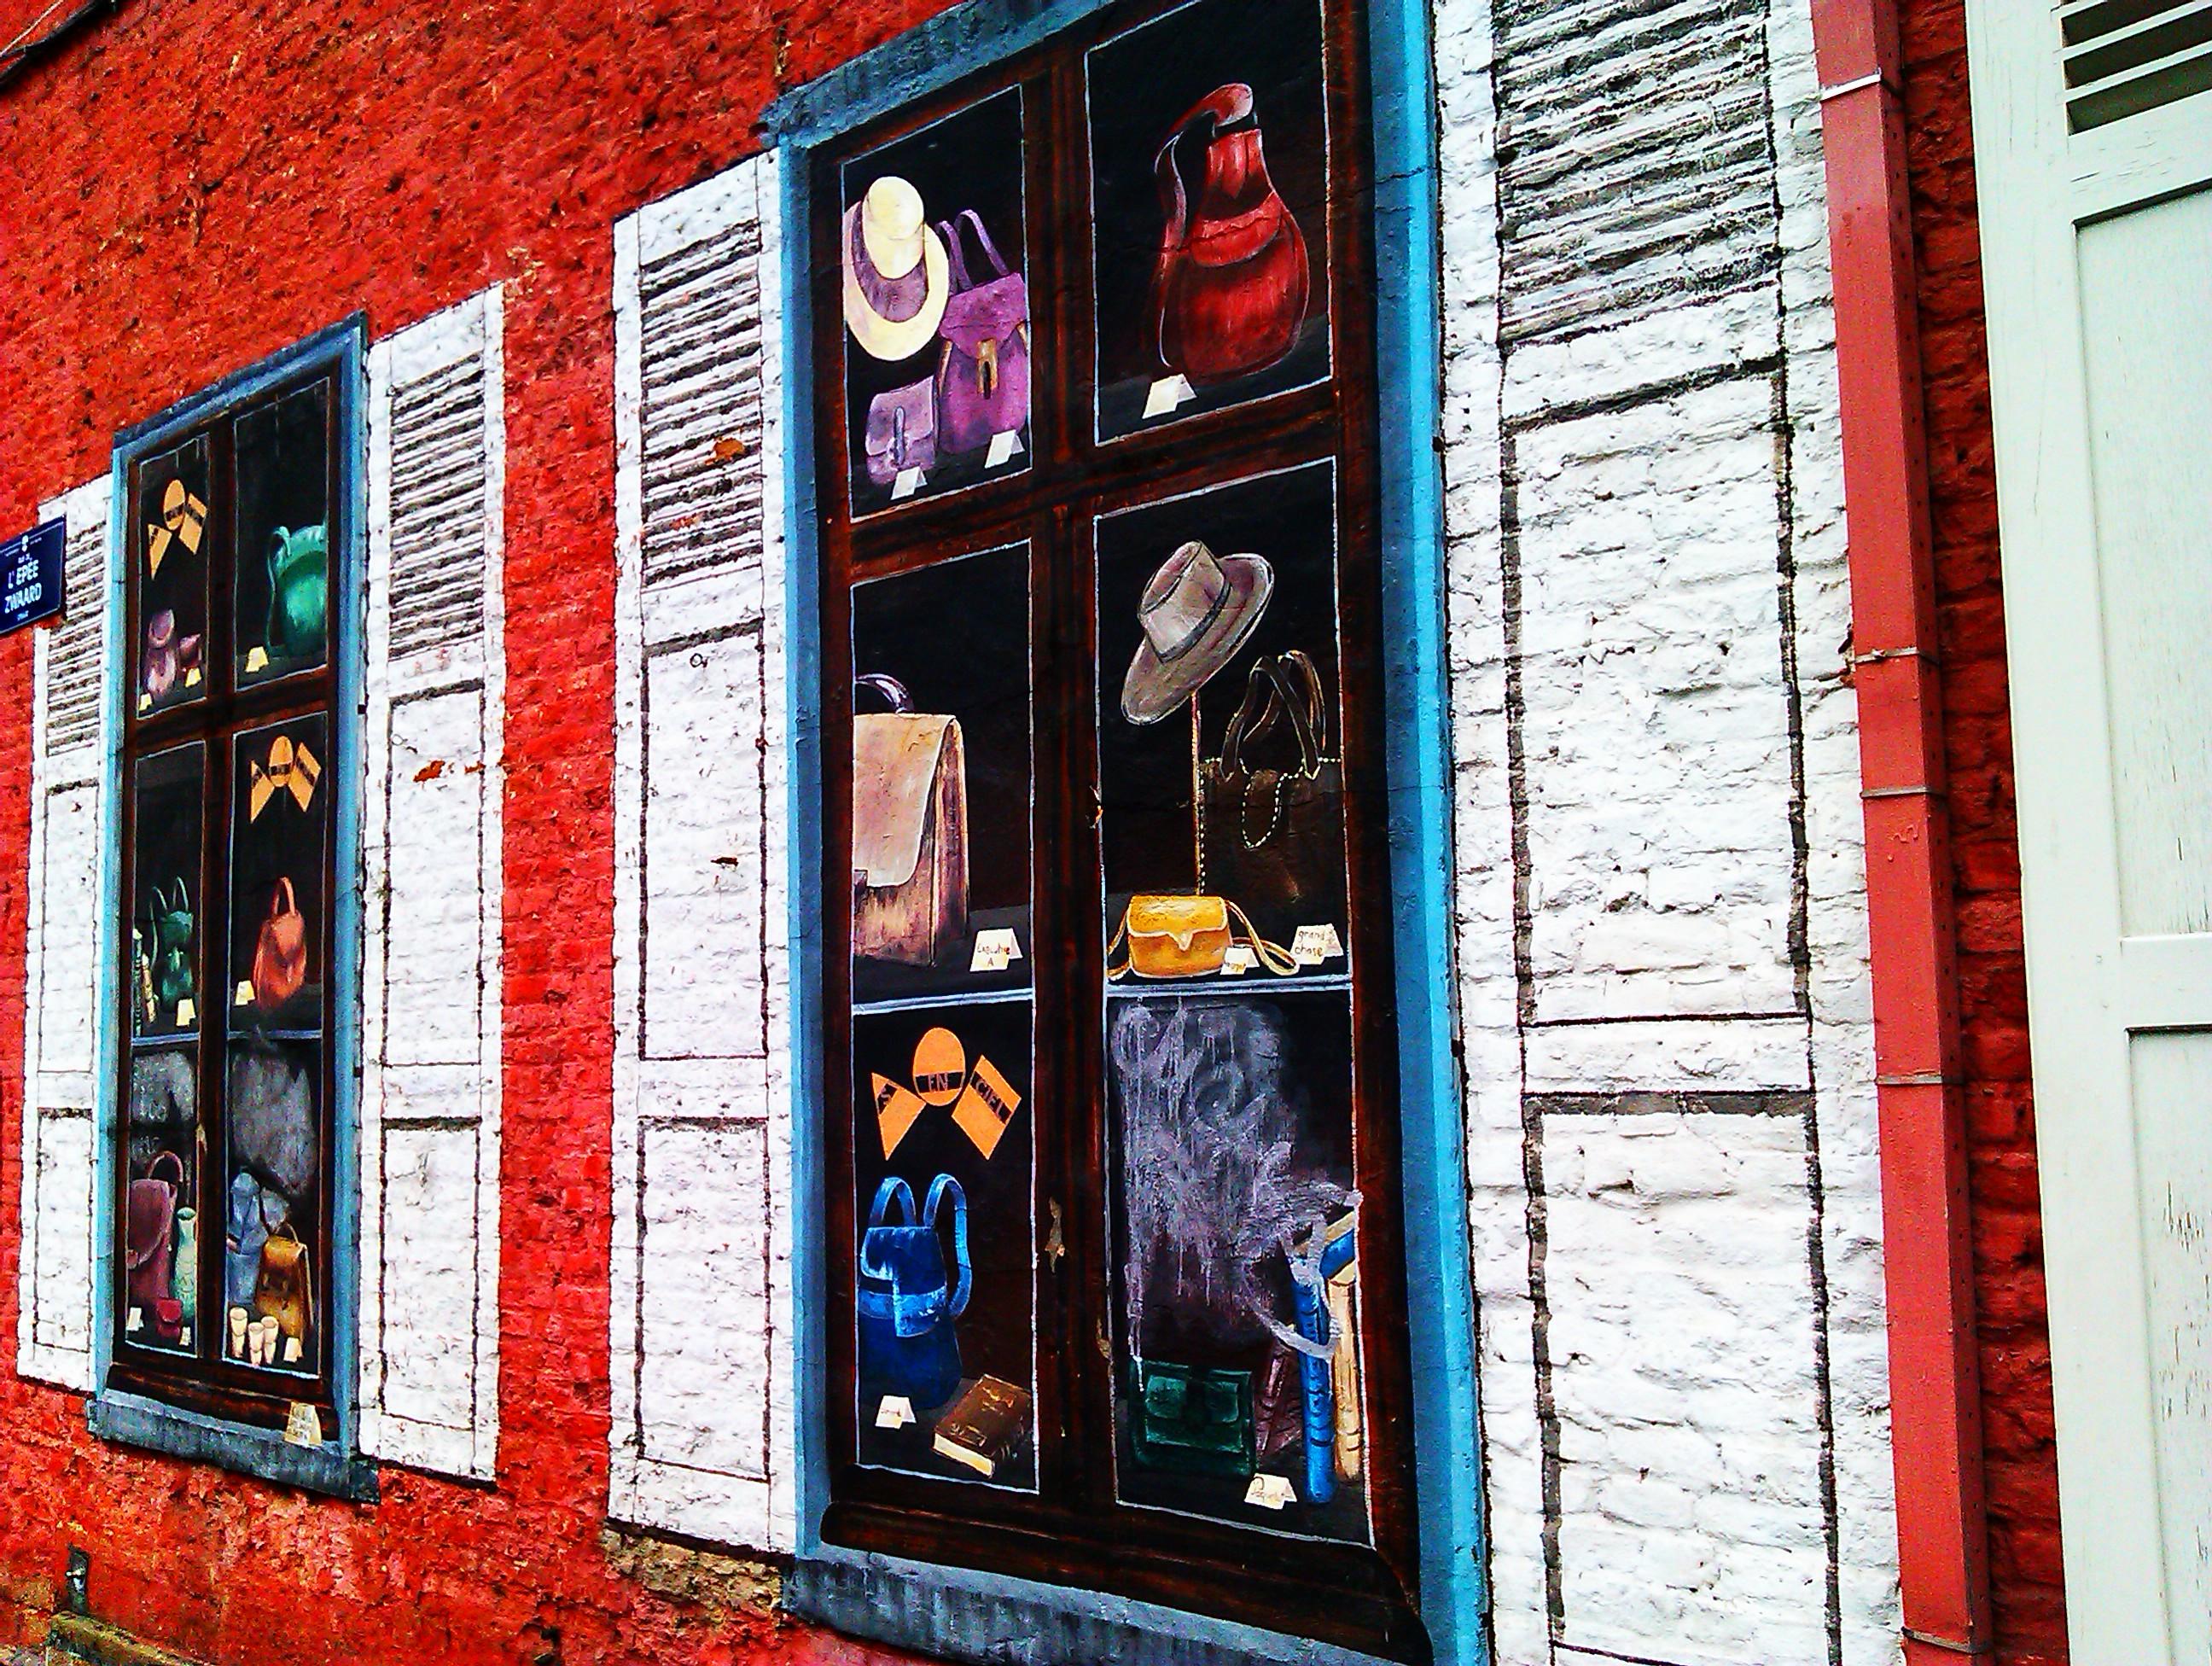 Pintor cambia muros por ventanas